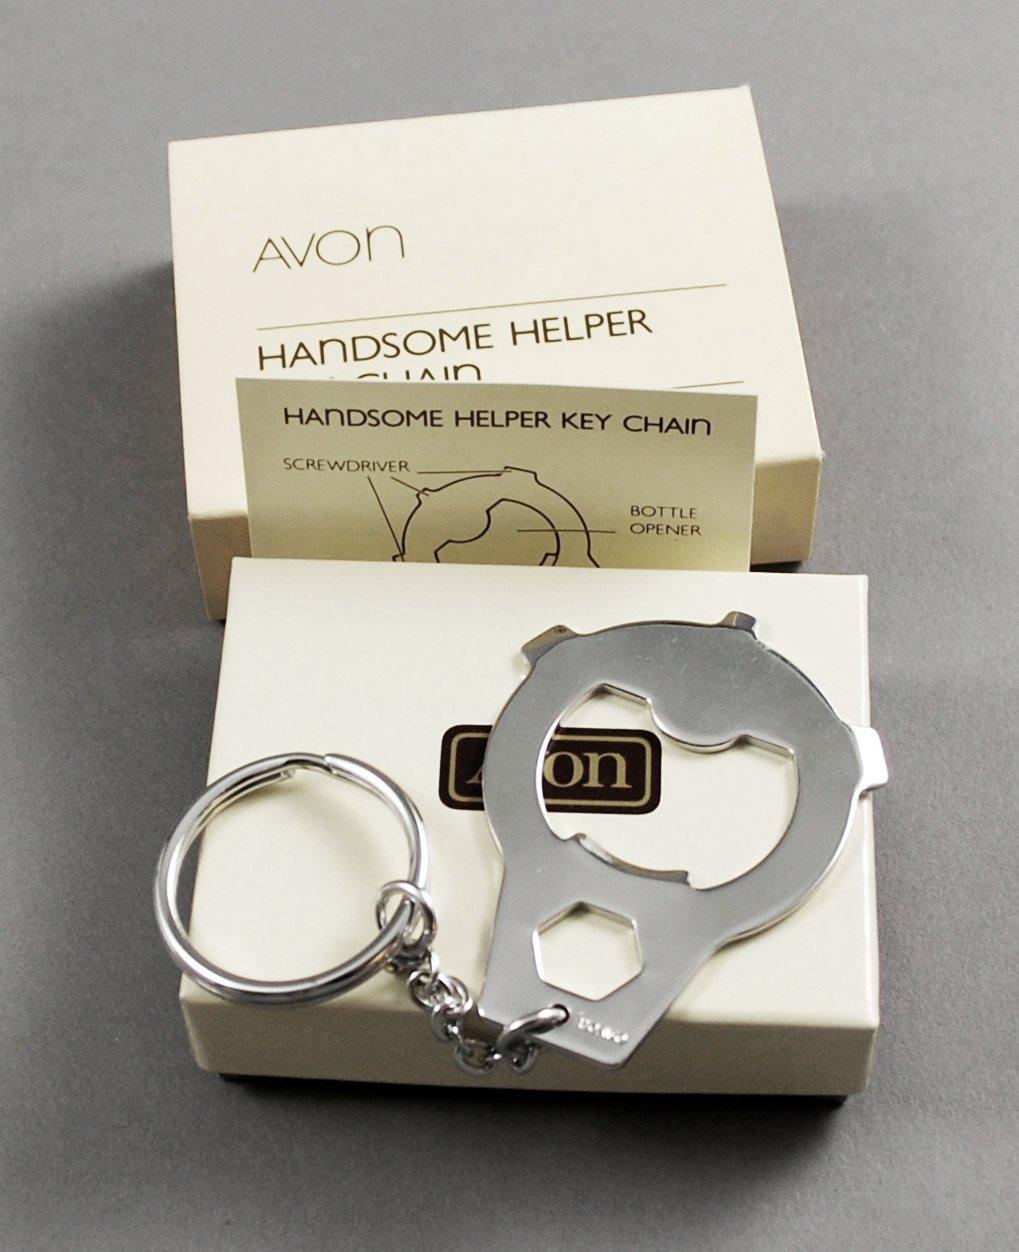 1984 Avon Handsome Helper Silver Tone Key Chain